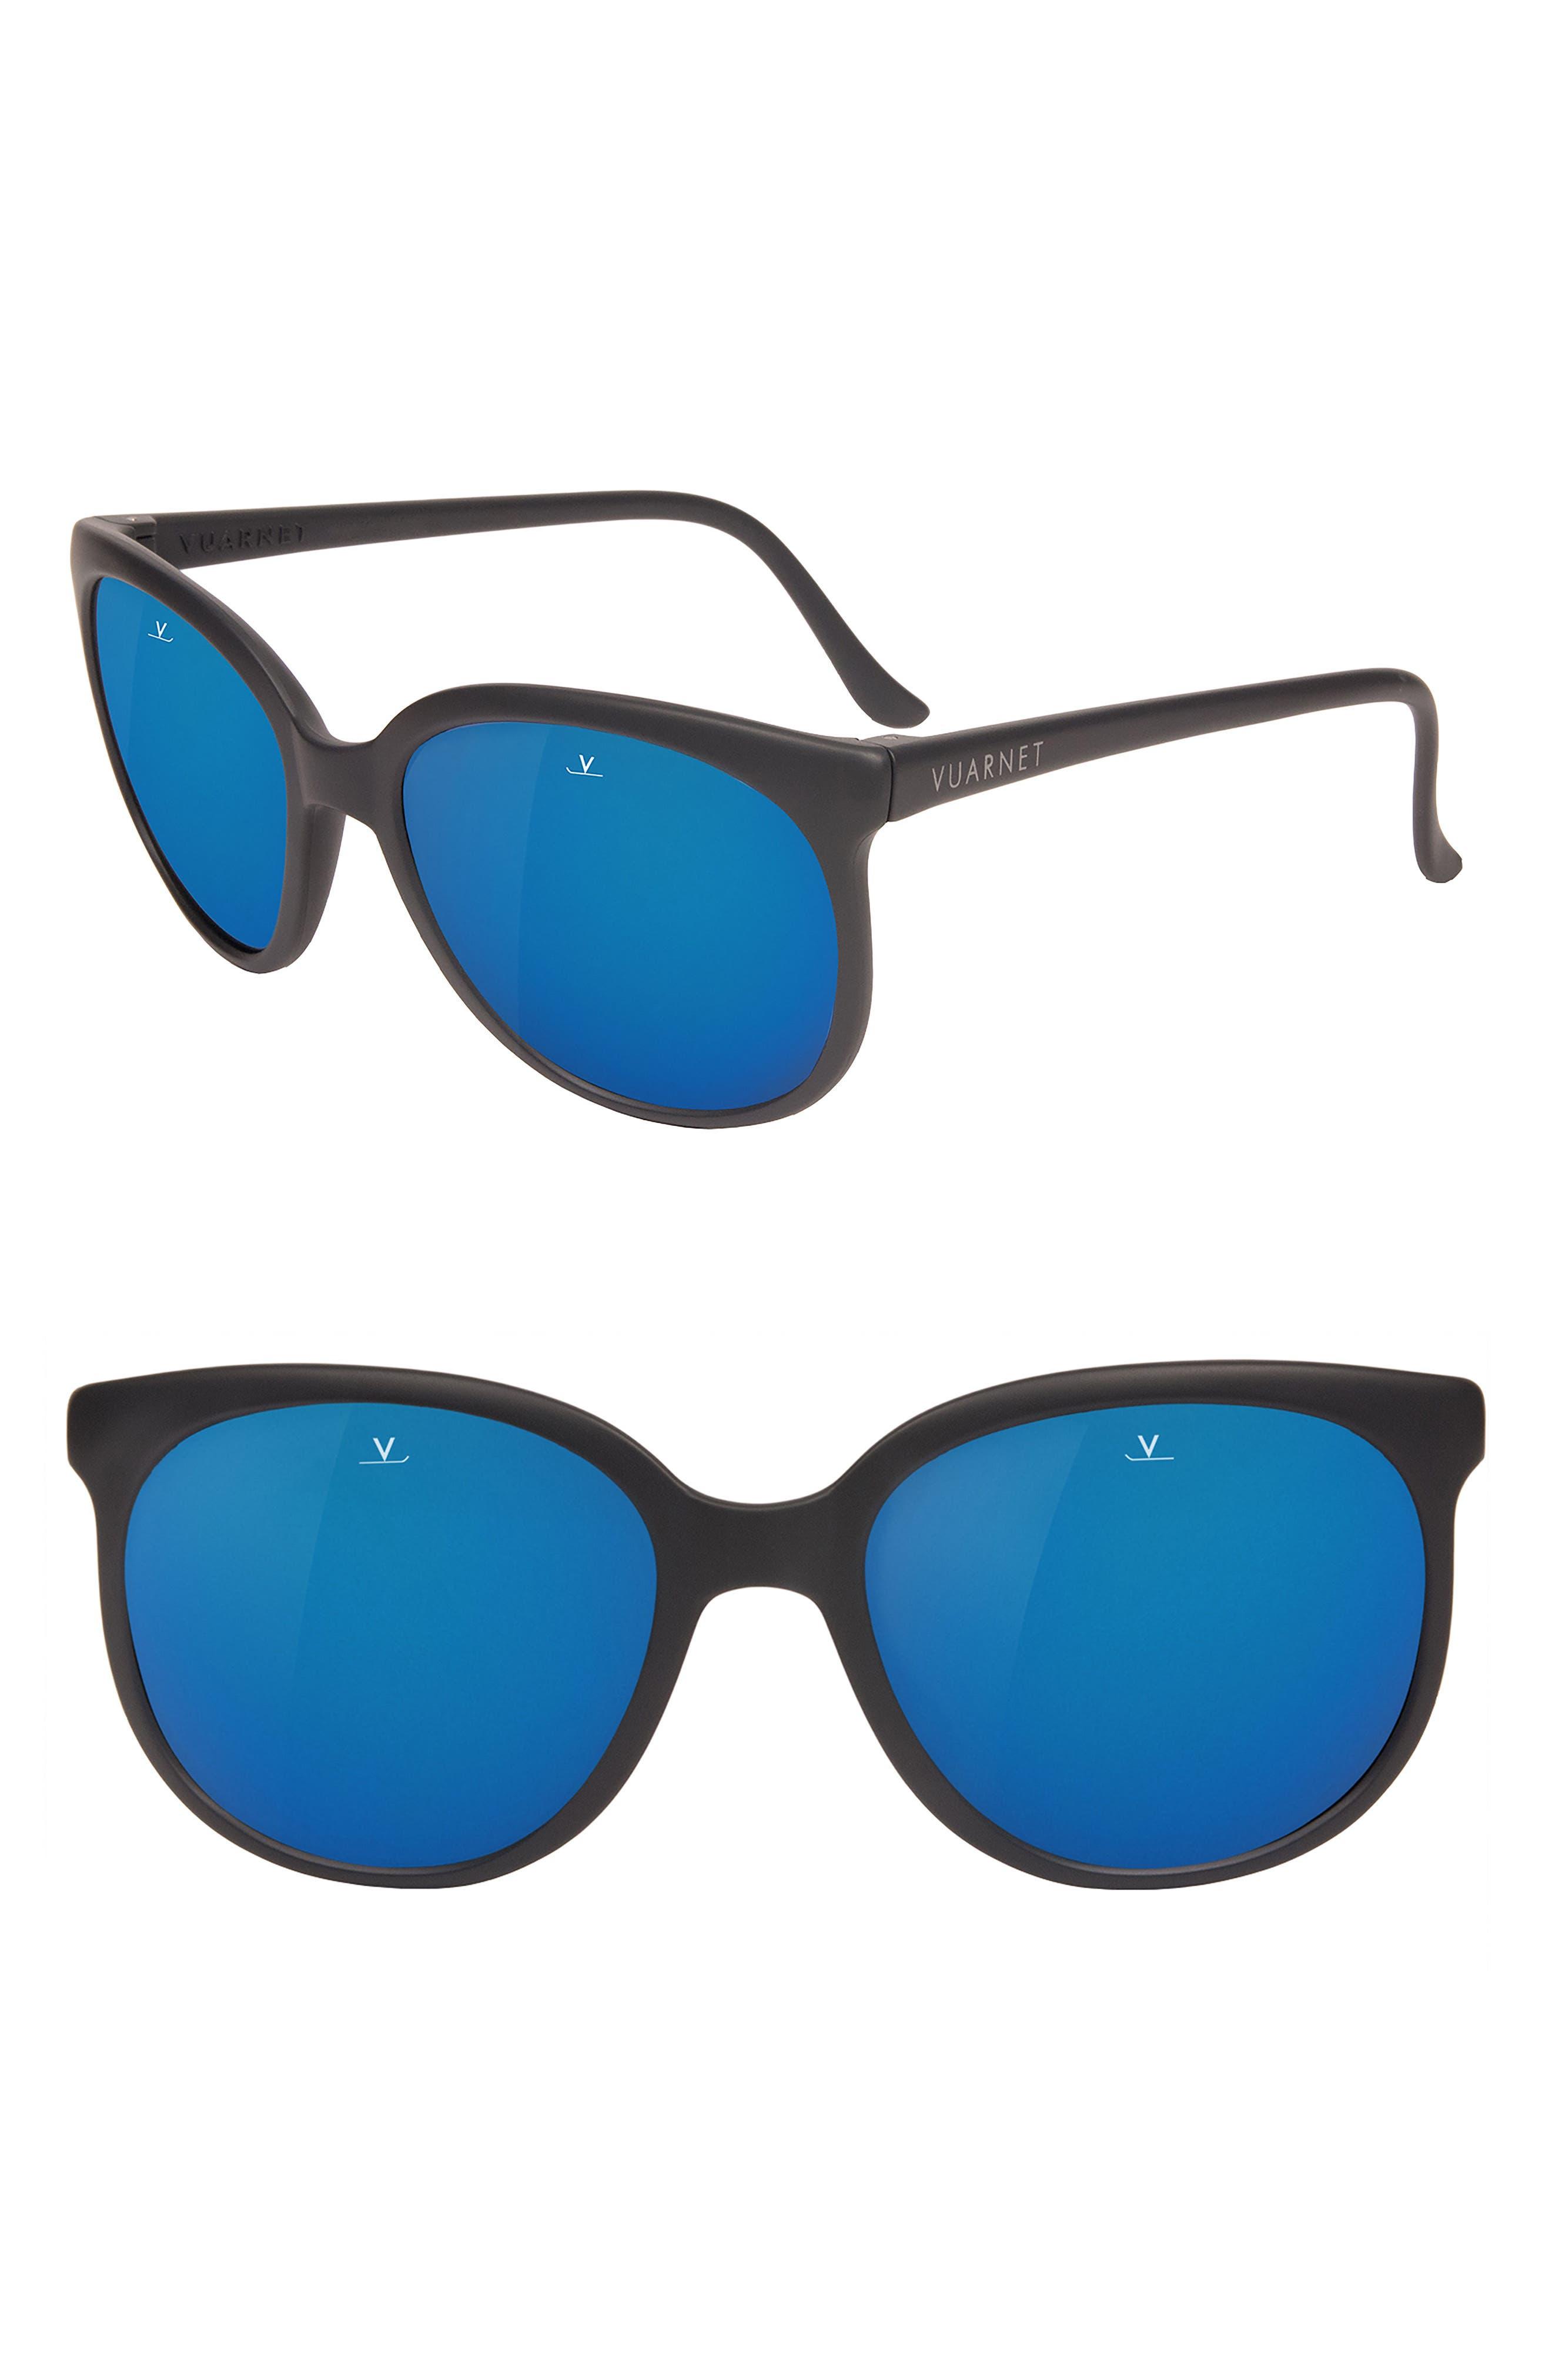 Legends 02 55mm Polarized Sunglasses,                             Main thumbnail 1, color,                             GREY POLAR BLUE FLASH